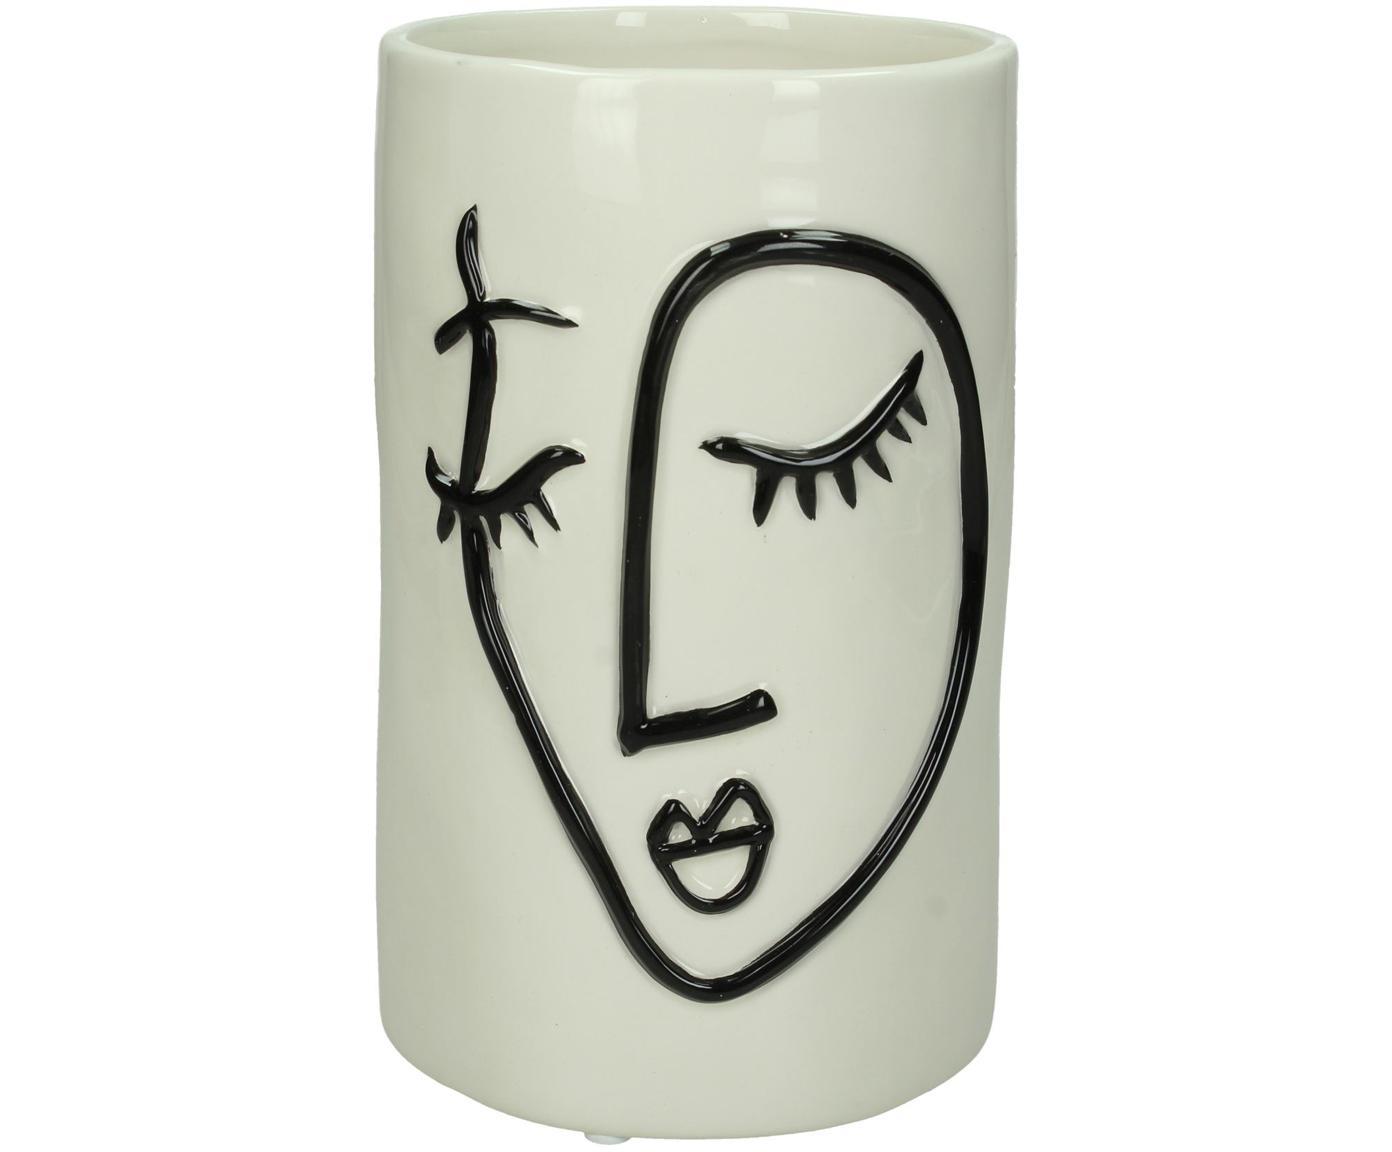 Portavaso Face, Terracotta, Bianco latteo, nero, Ø 11 x Alt. 18 cm